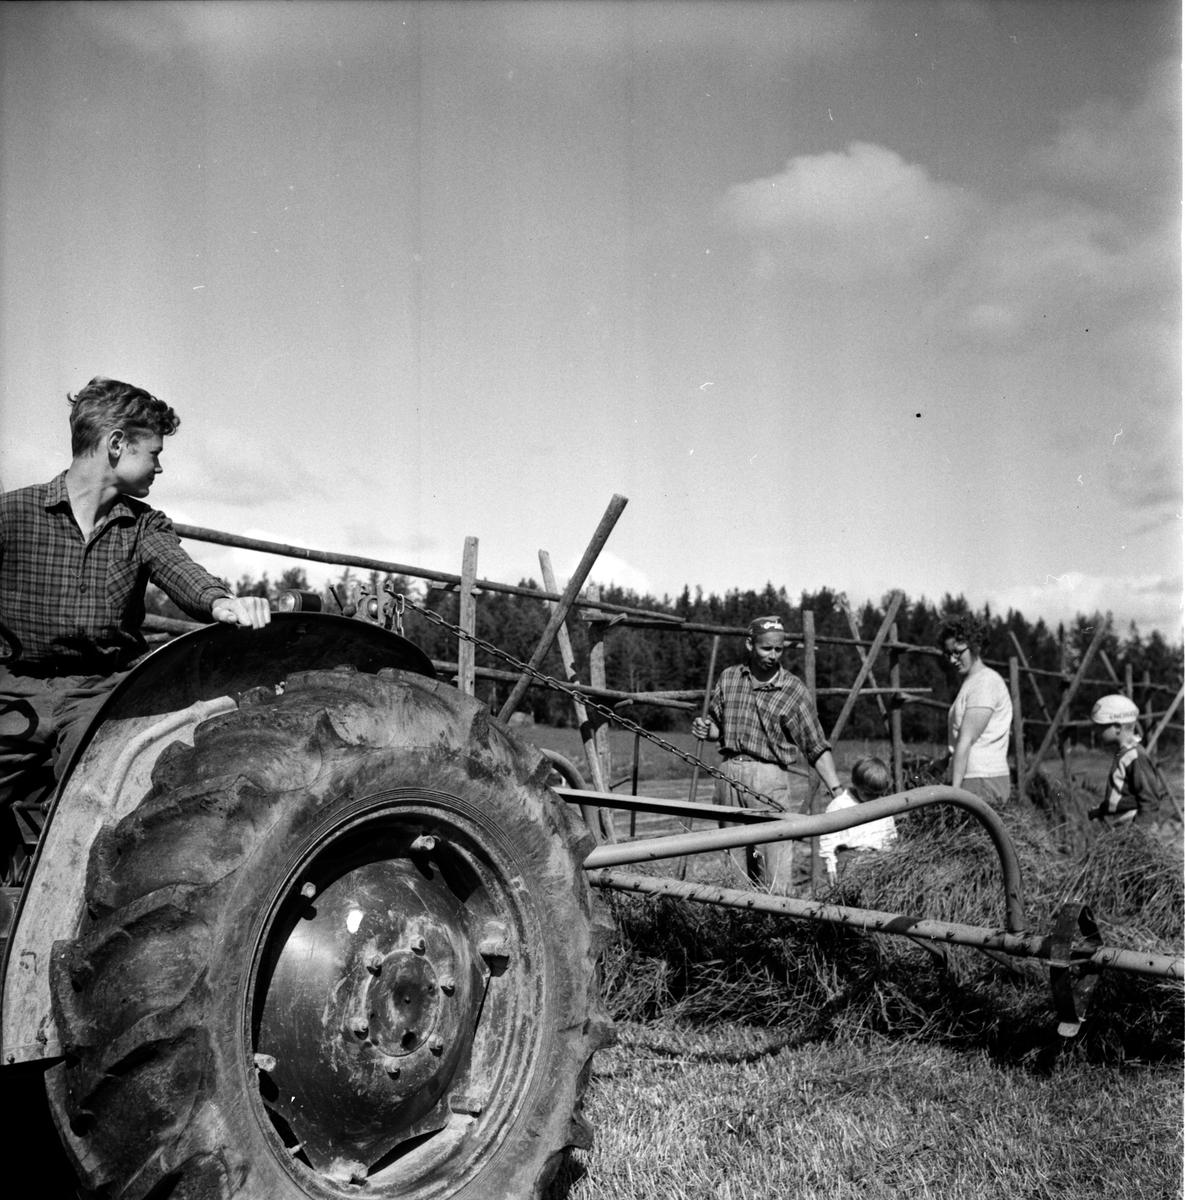 Hertsjö, Olle Hansson slåttar, 1 Juli 1965